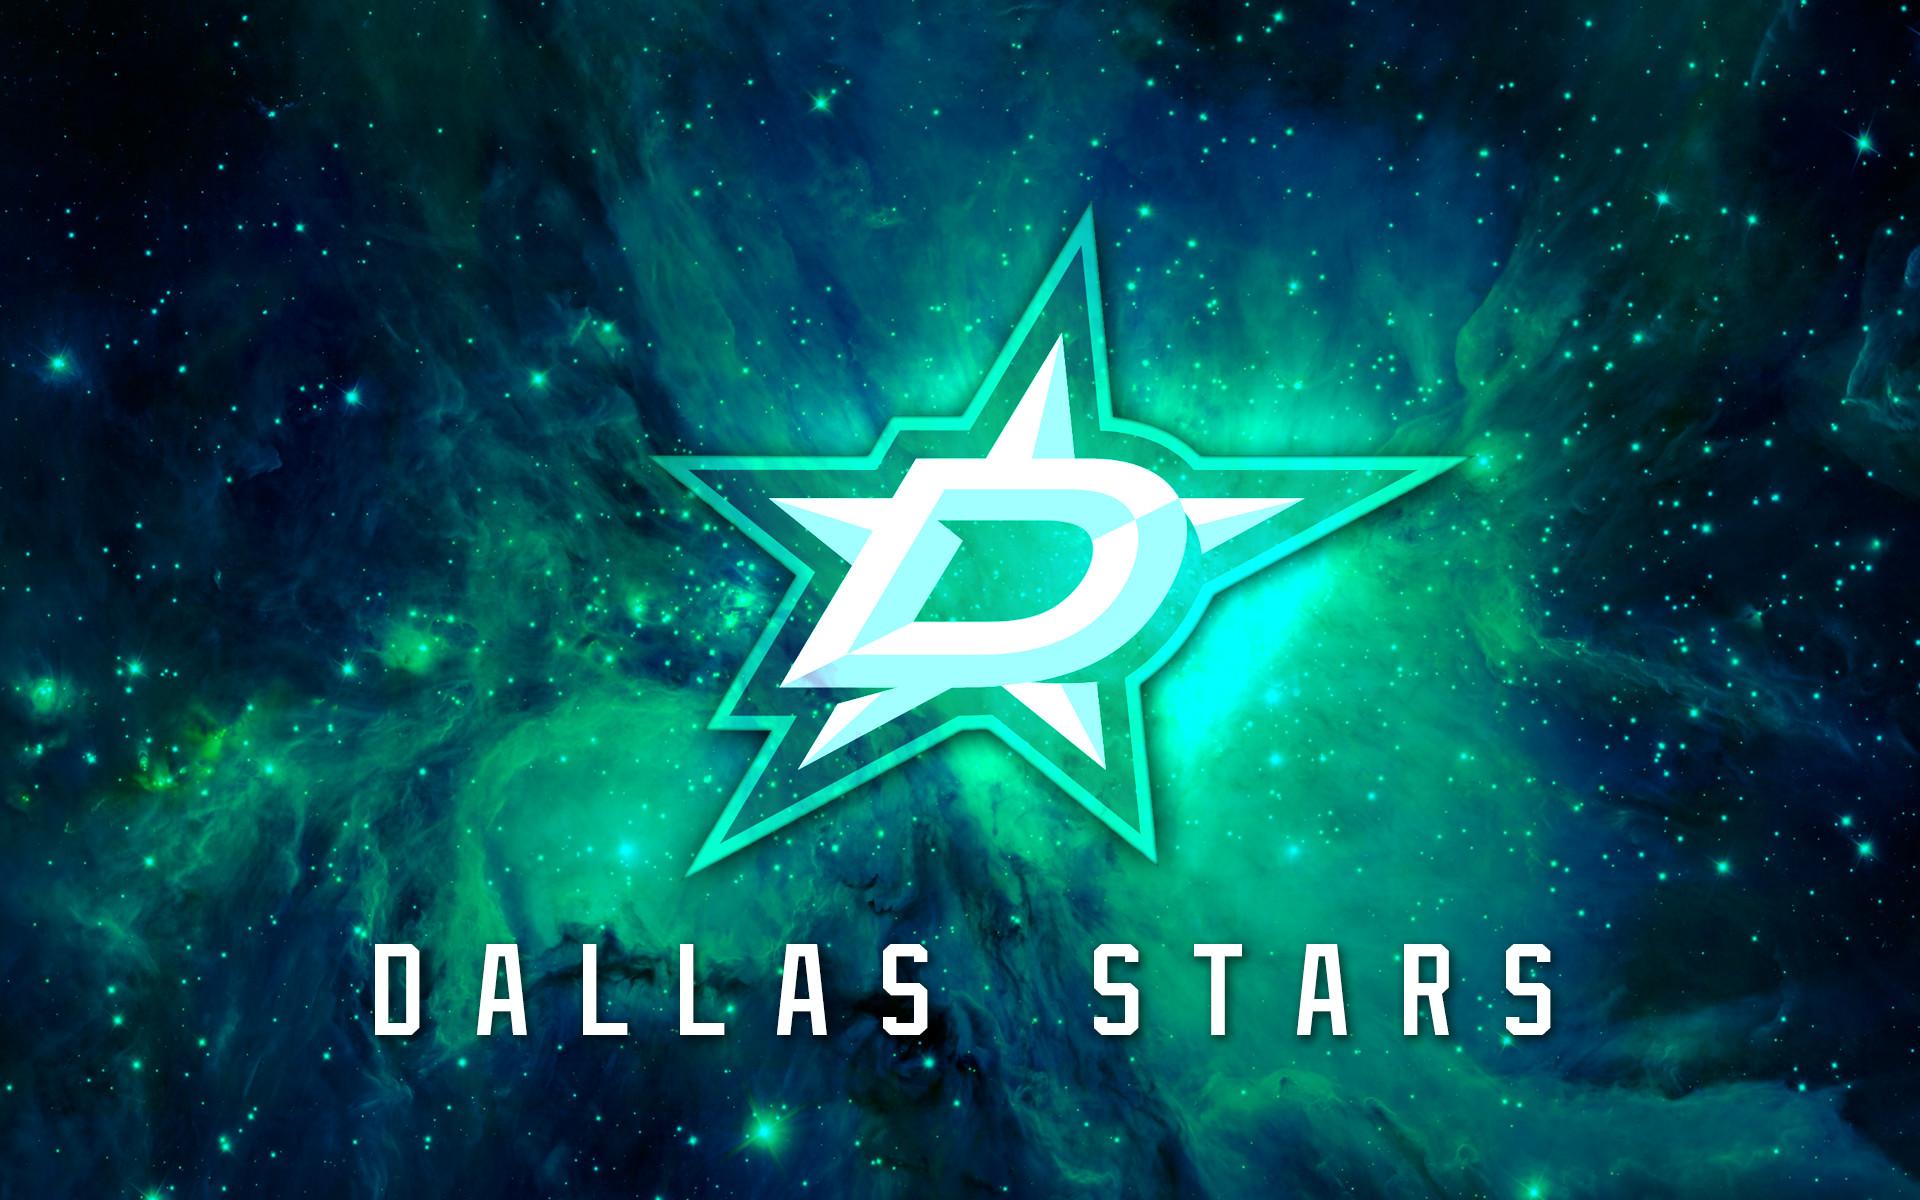 Dallas Stars Mobile Wallpaper 73 Images